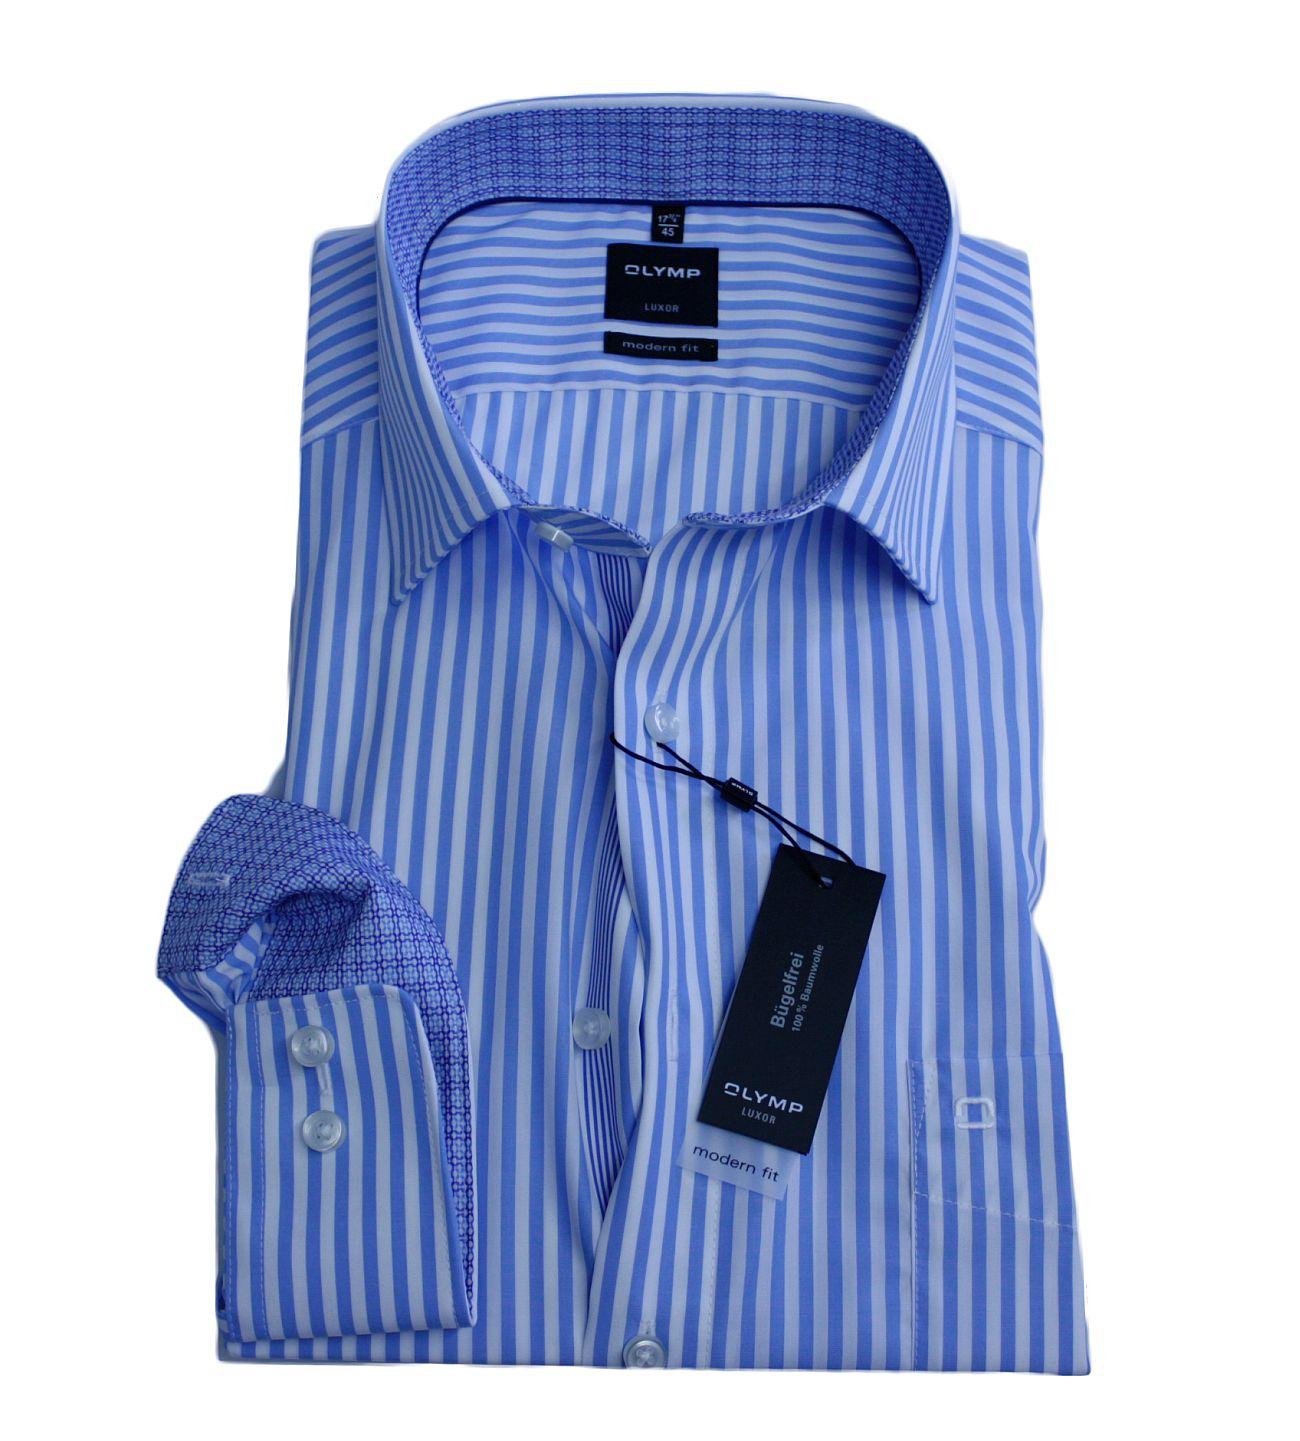 hot sale online 17f08 504de Olymp Luxor Hemd, gestreift, hellblau/weiß